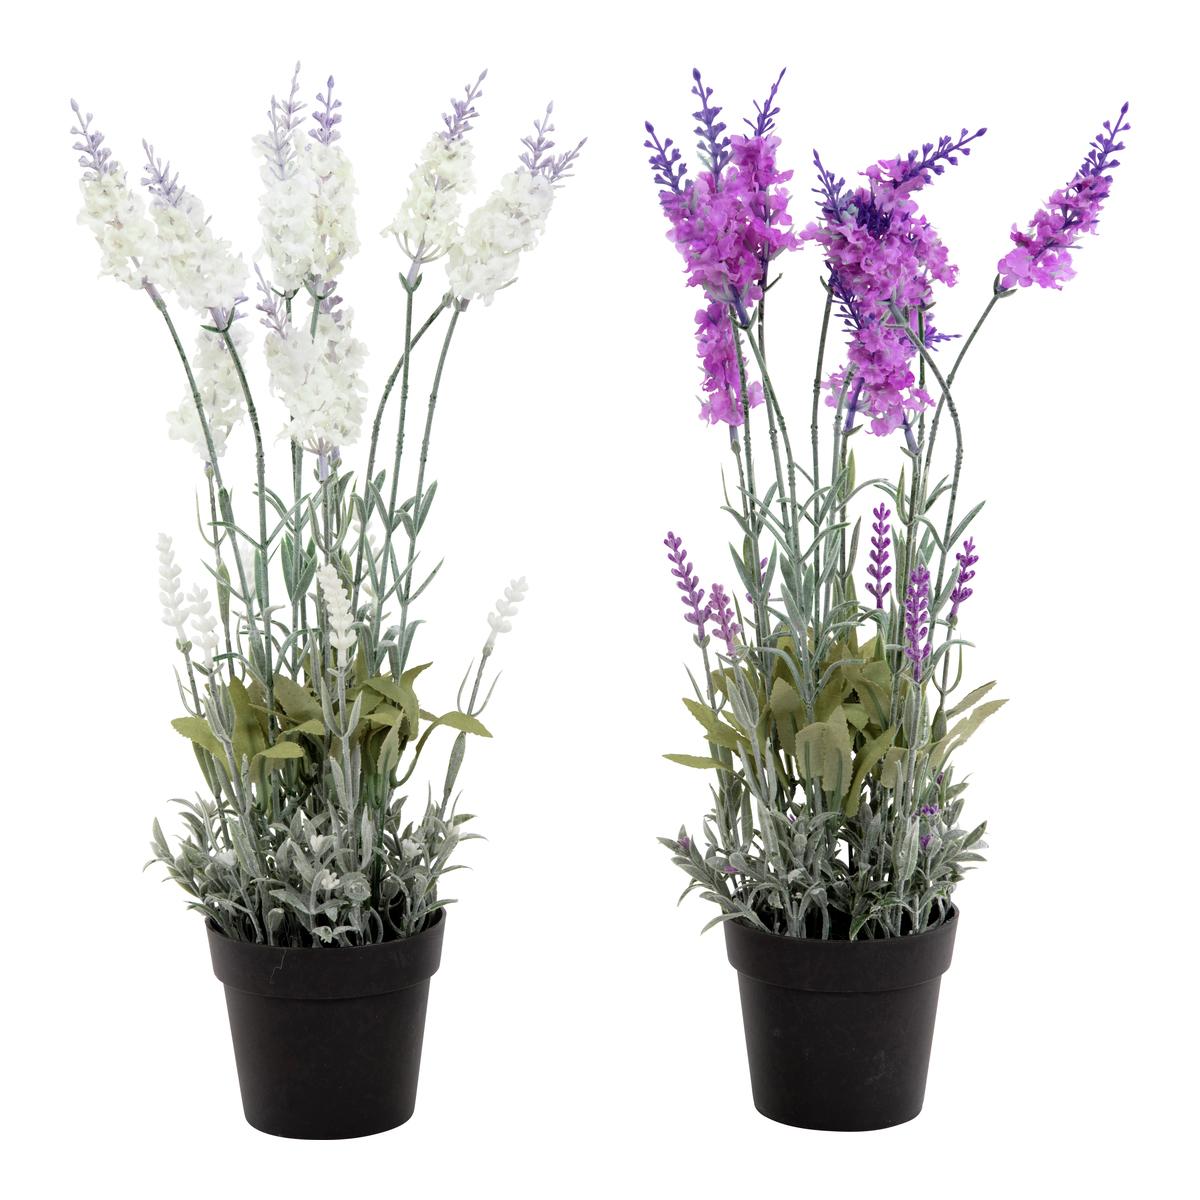 Lavendel i potte